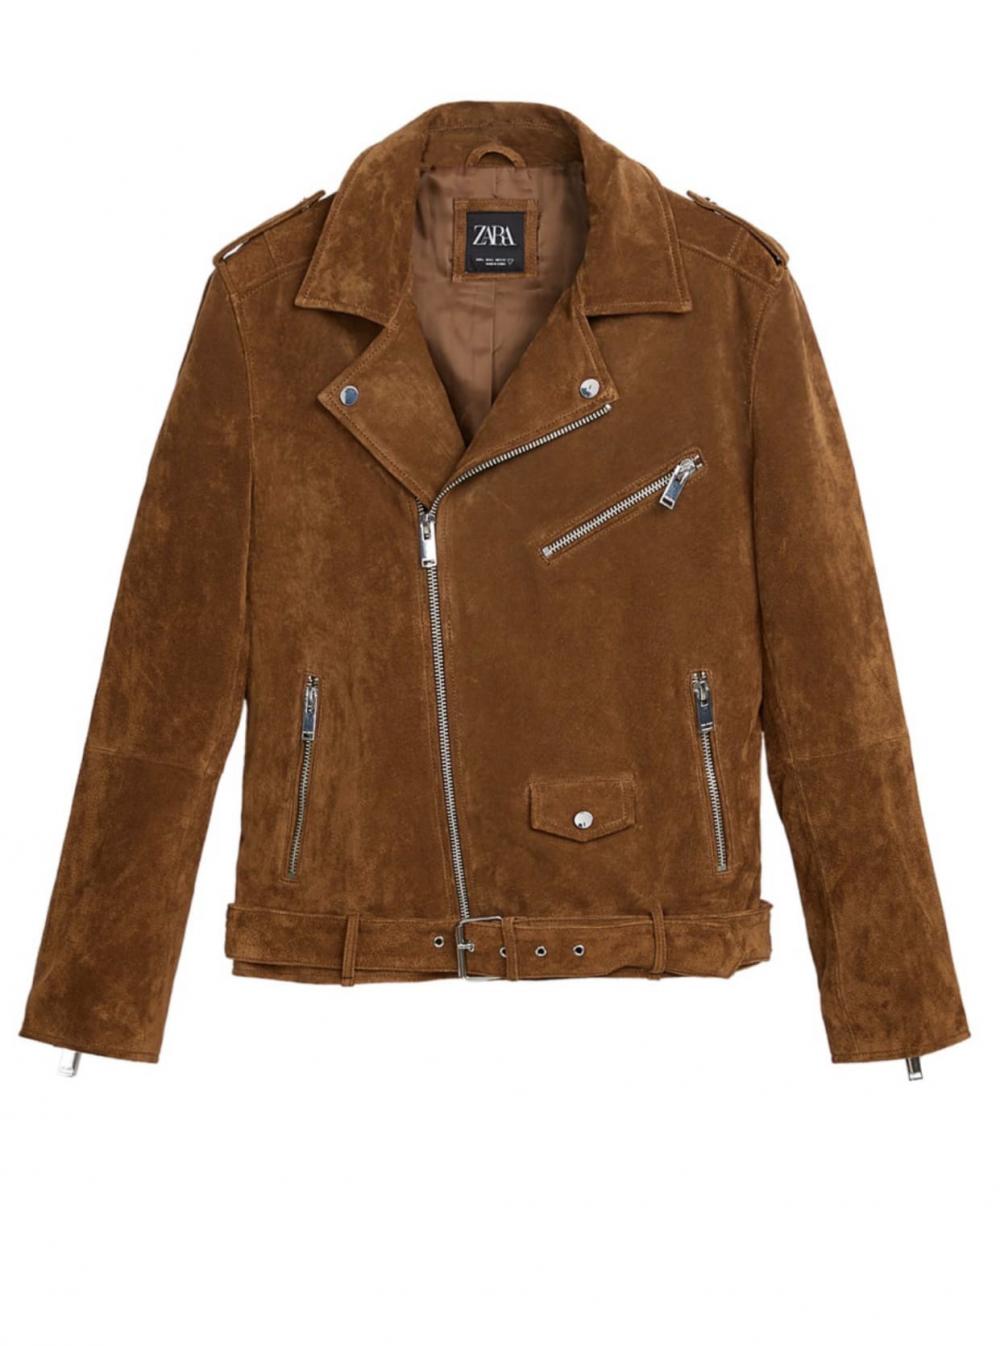 Кожаная куртка Zara, размер XL